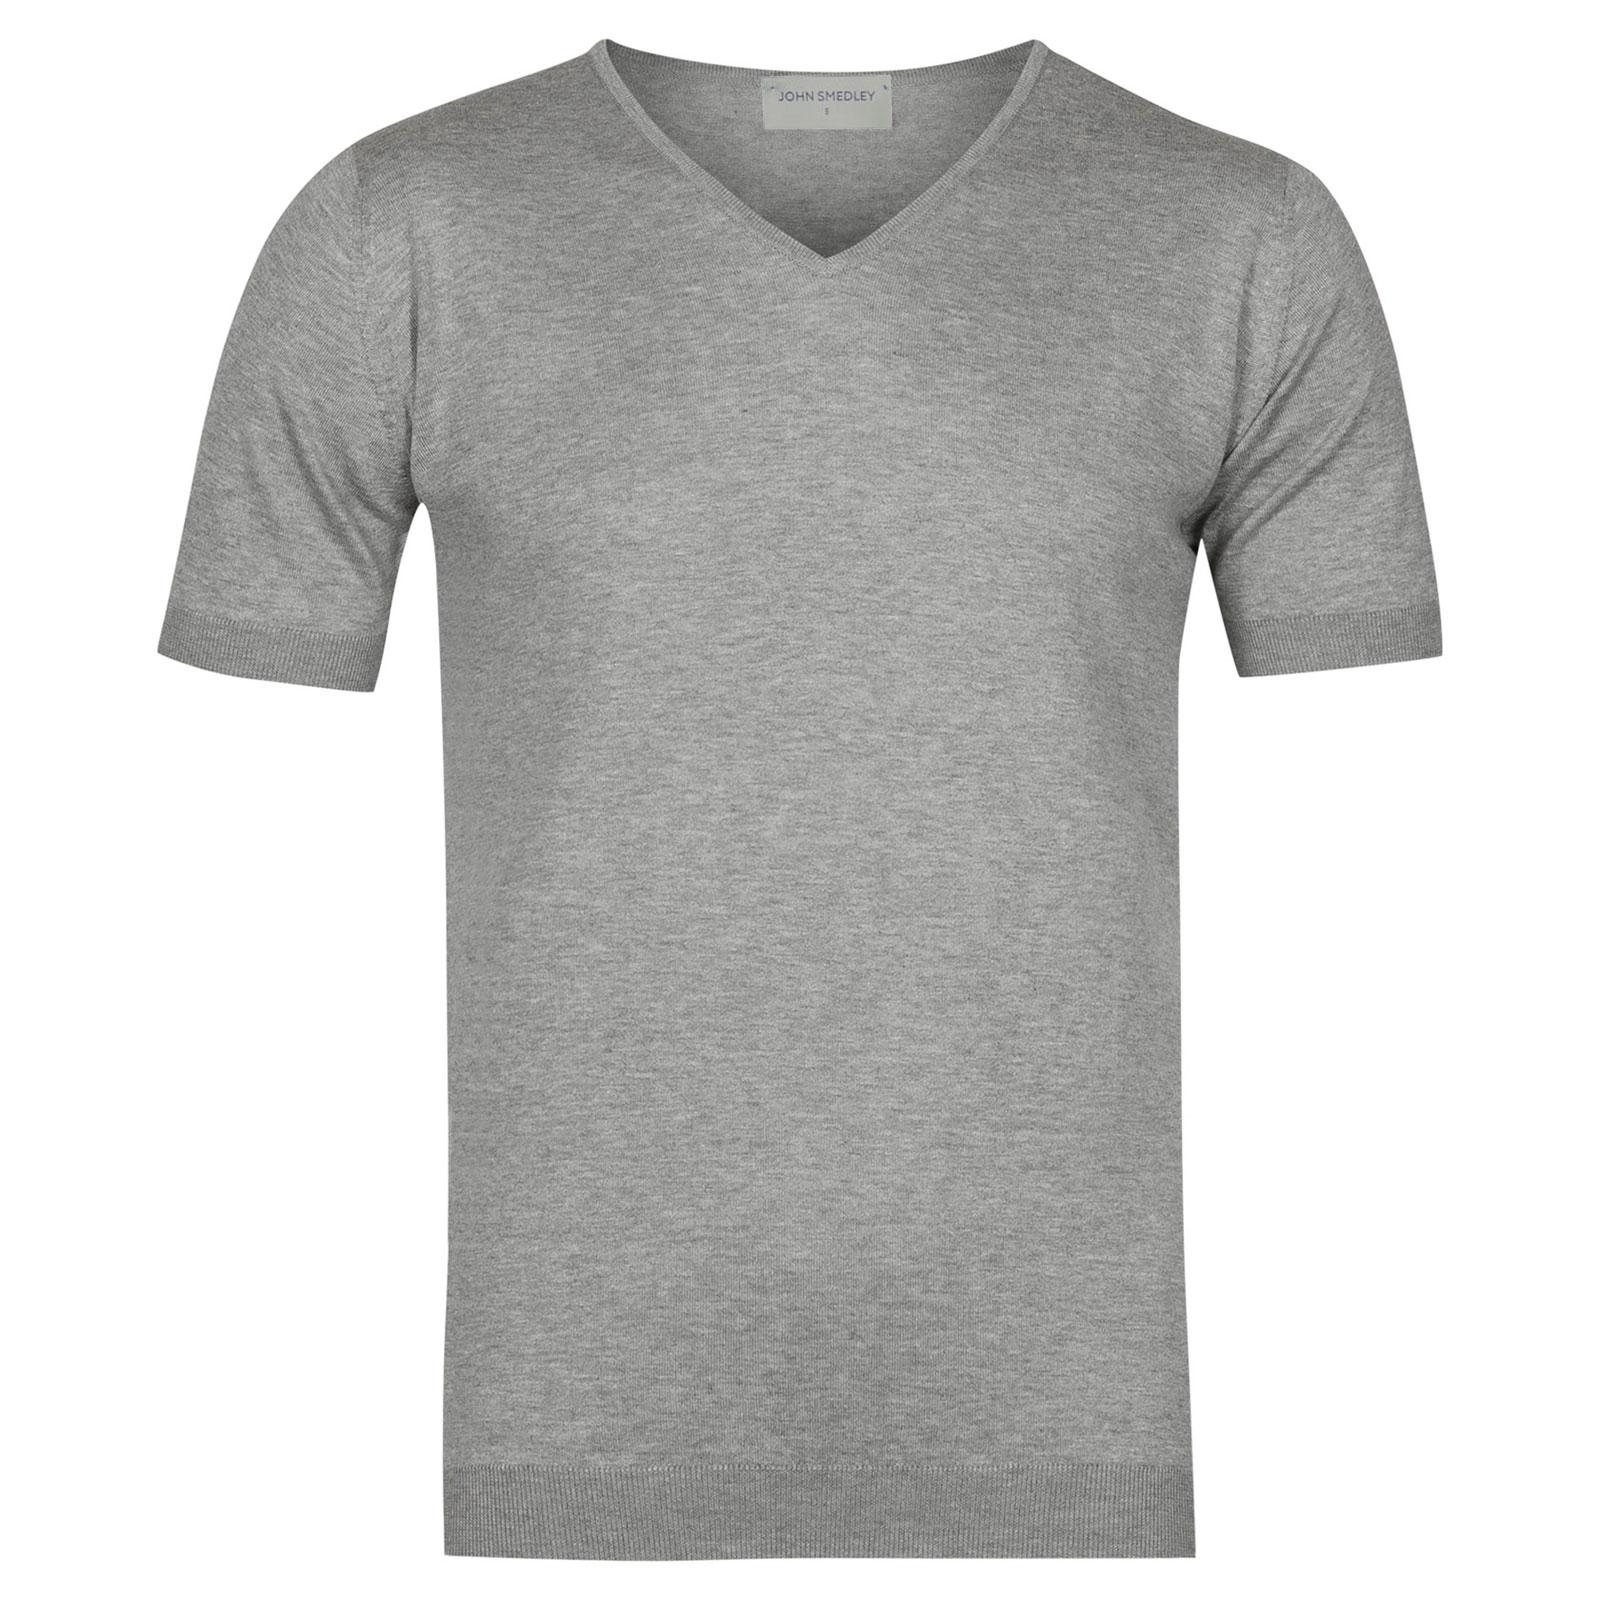 John Smedley Braedon Sea Island Cotton T-shirt in Silver-L